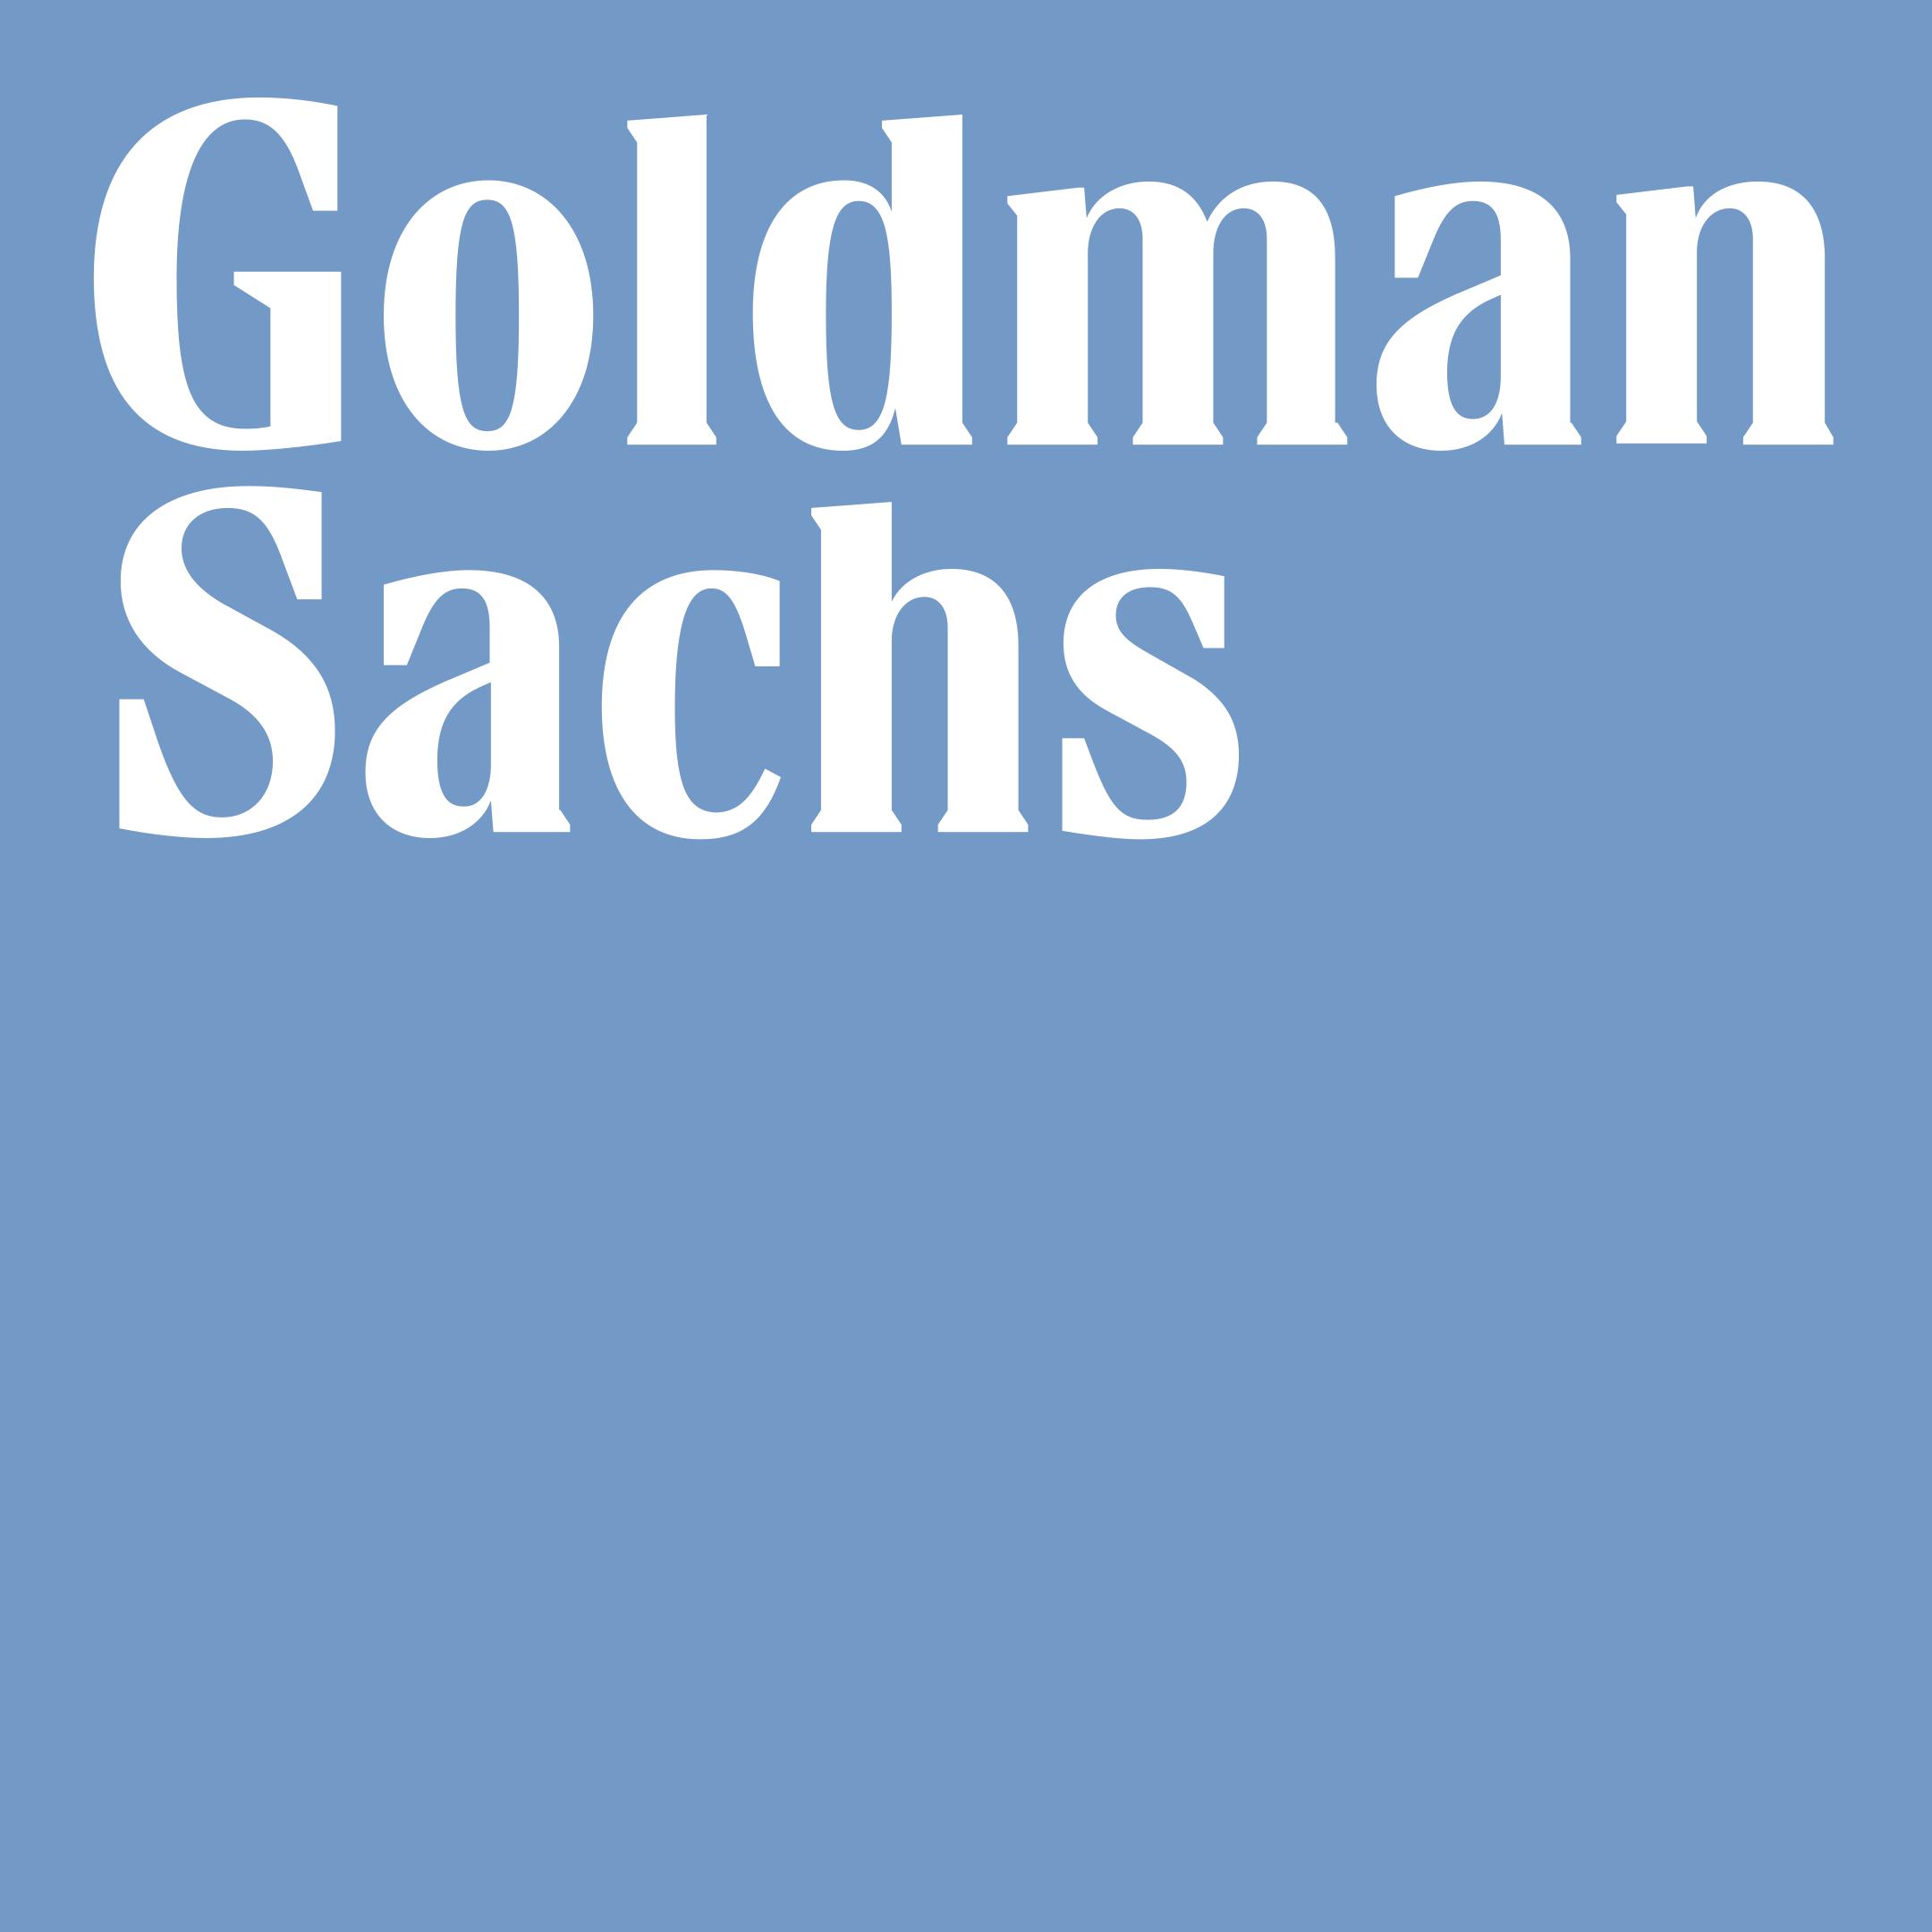 goldman sachs logo 1 - Goldman Sachs Logo